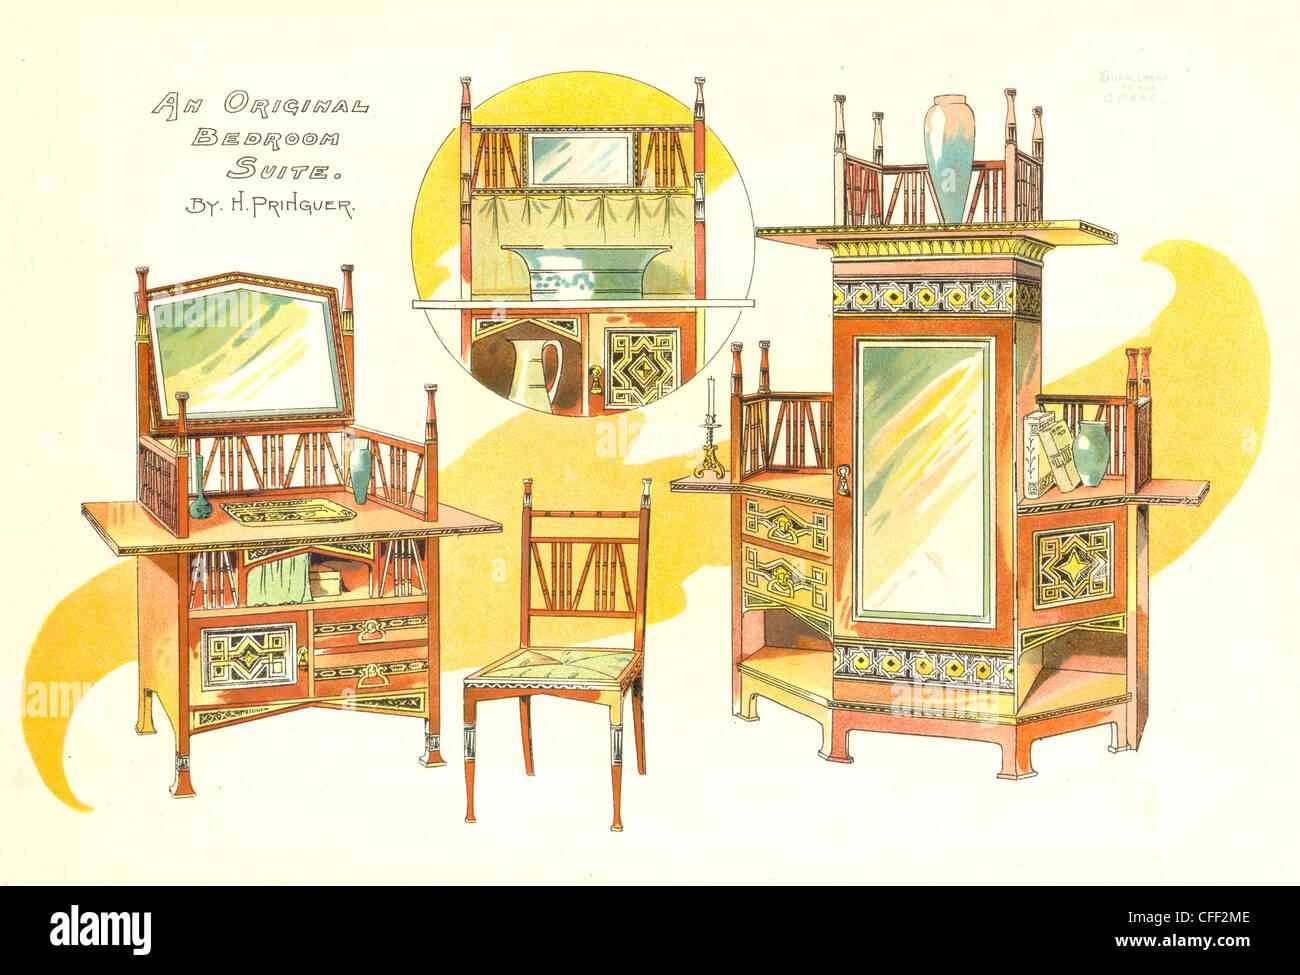 H Pringuer furnishings